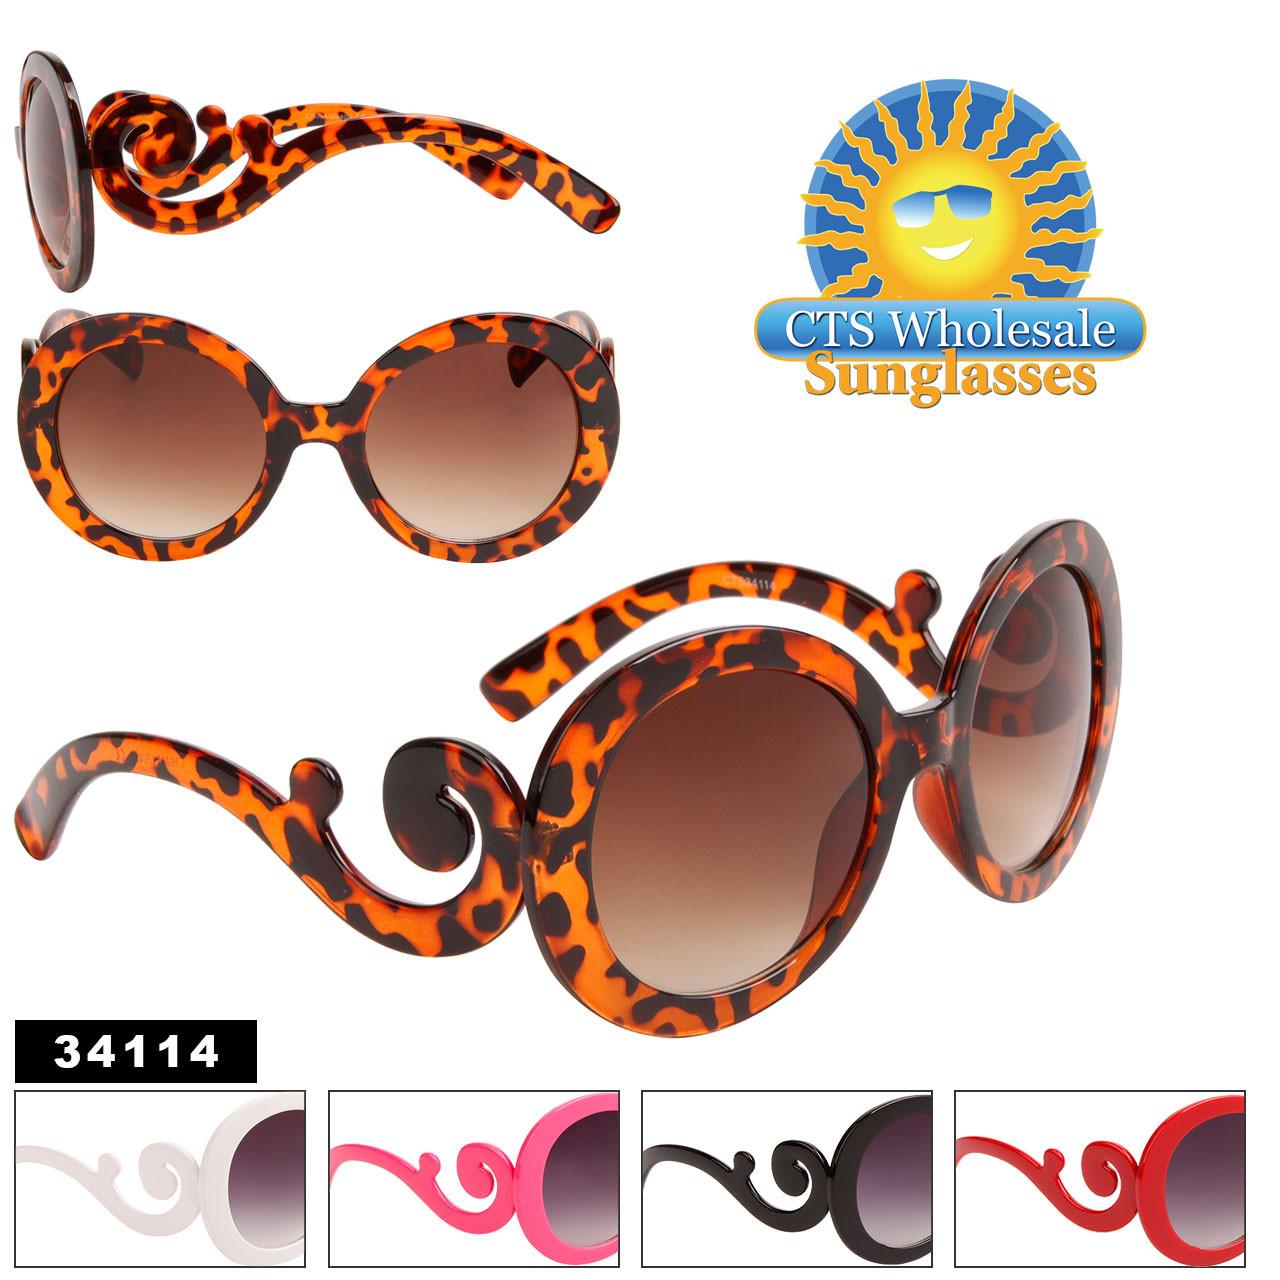 Lady Gaga Fashion Wholesale Sunglasses - Style #34114